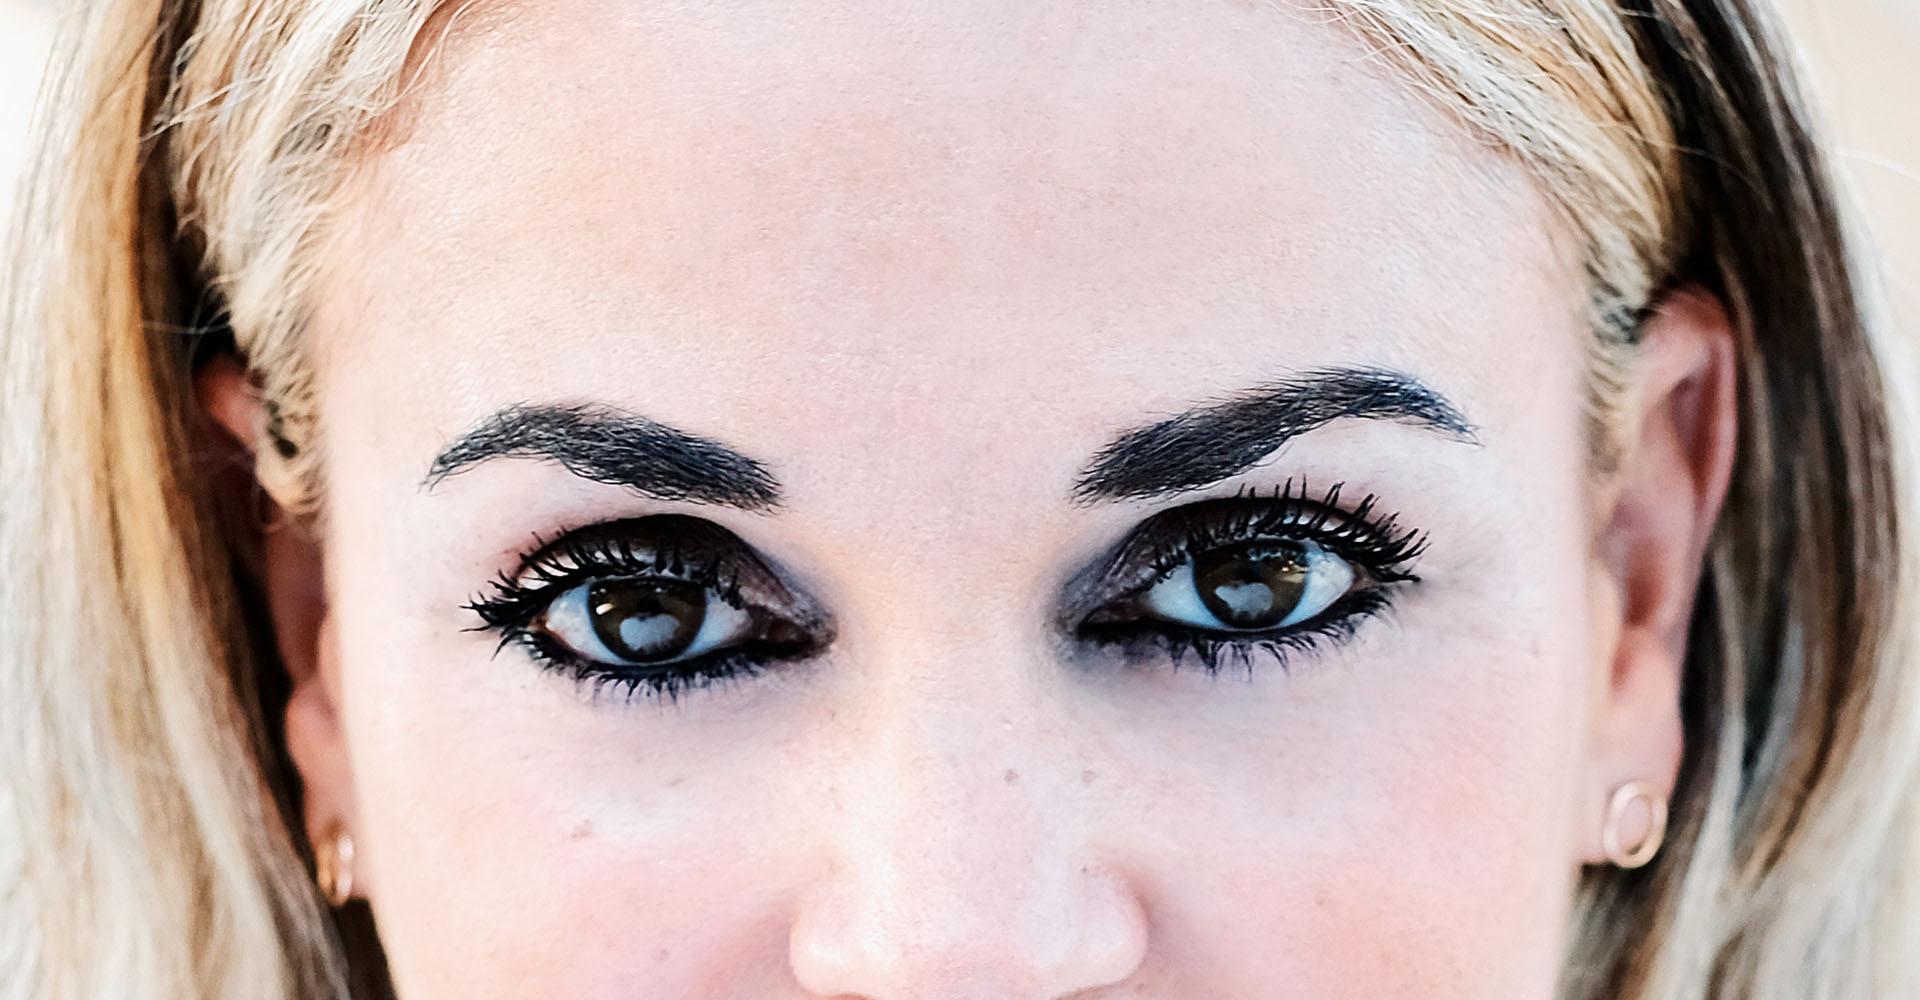 Henna-natural-cejas-tratamiento-mirada-resukare-estetica